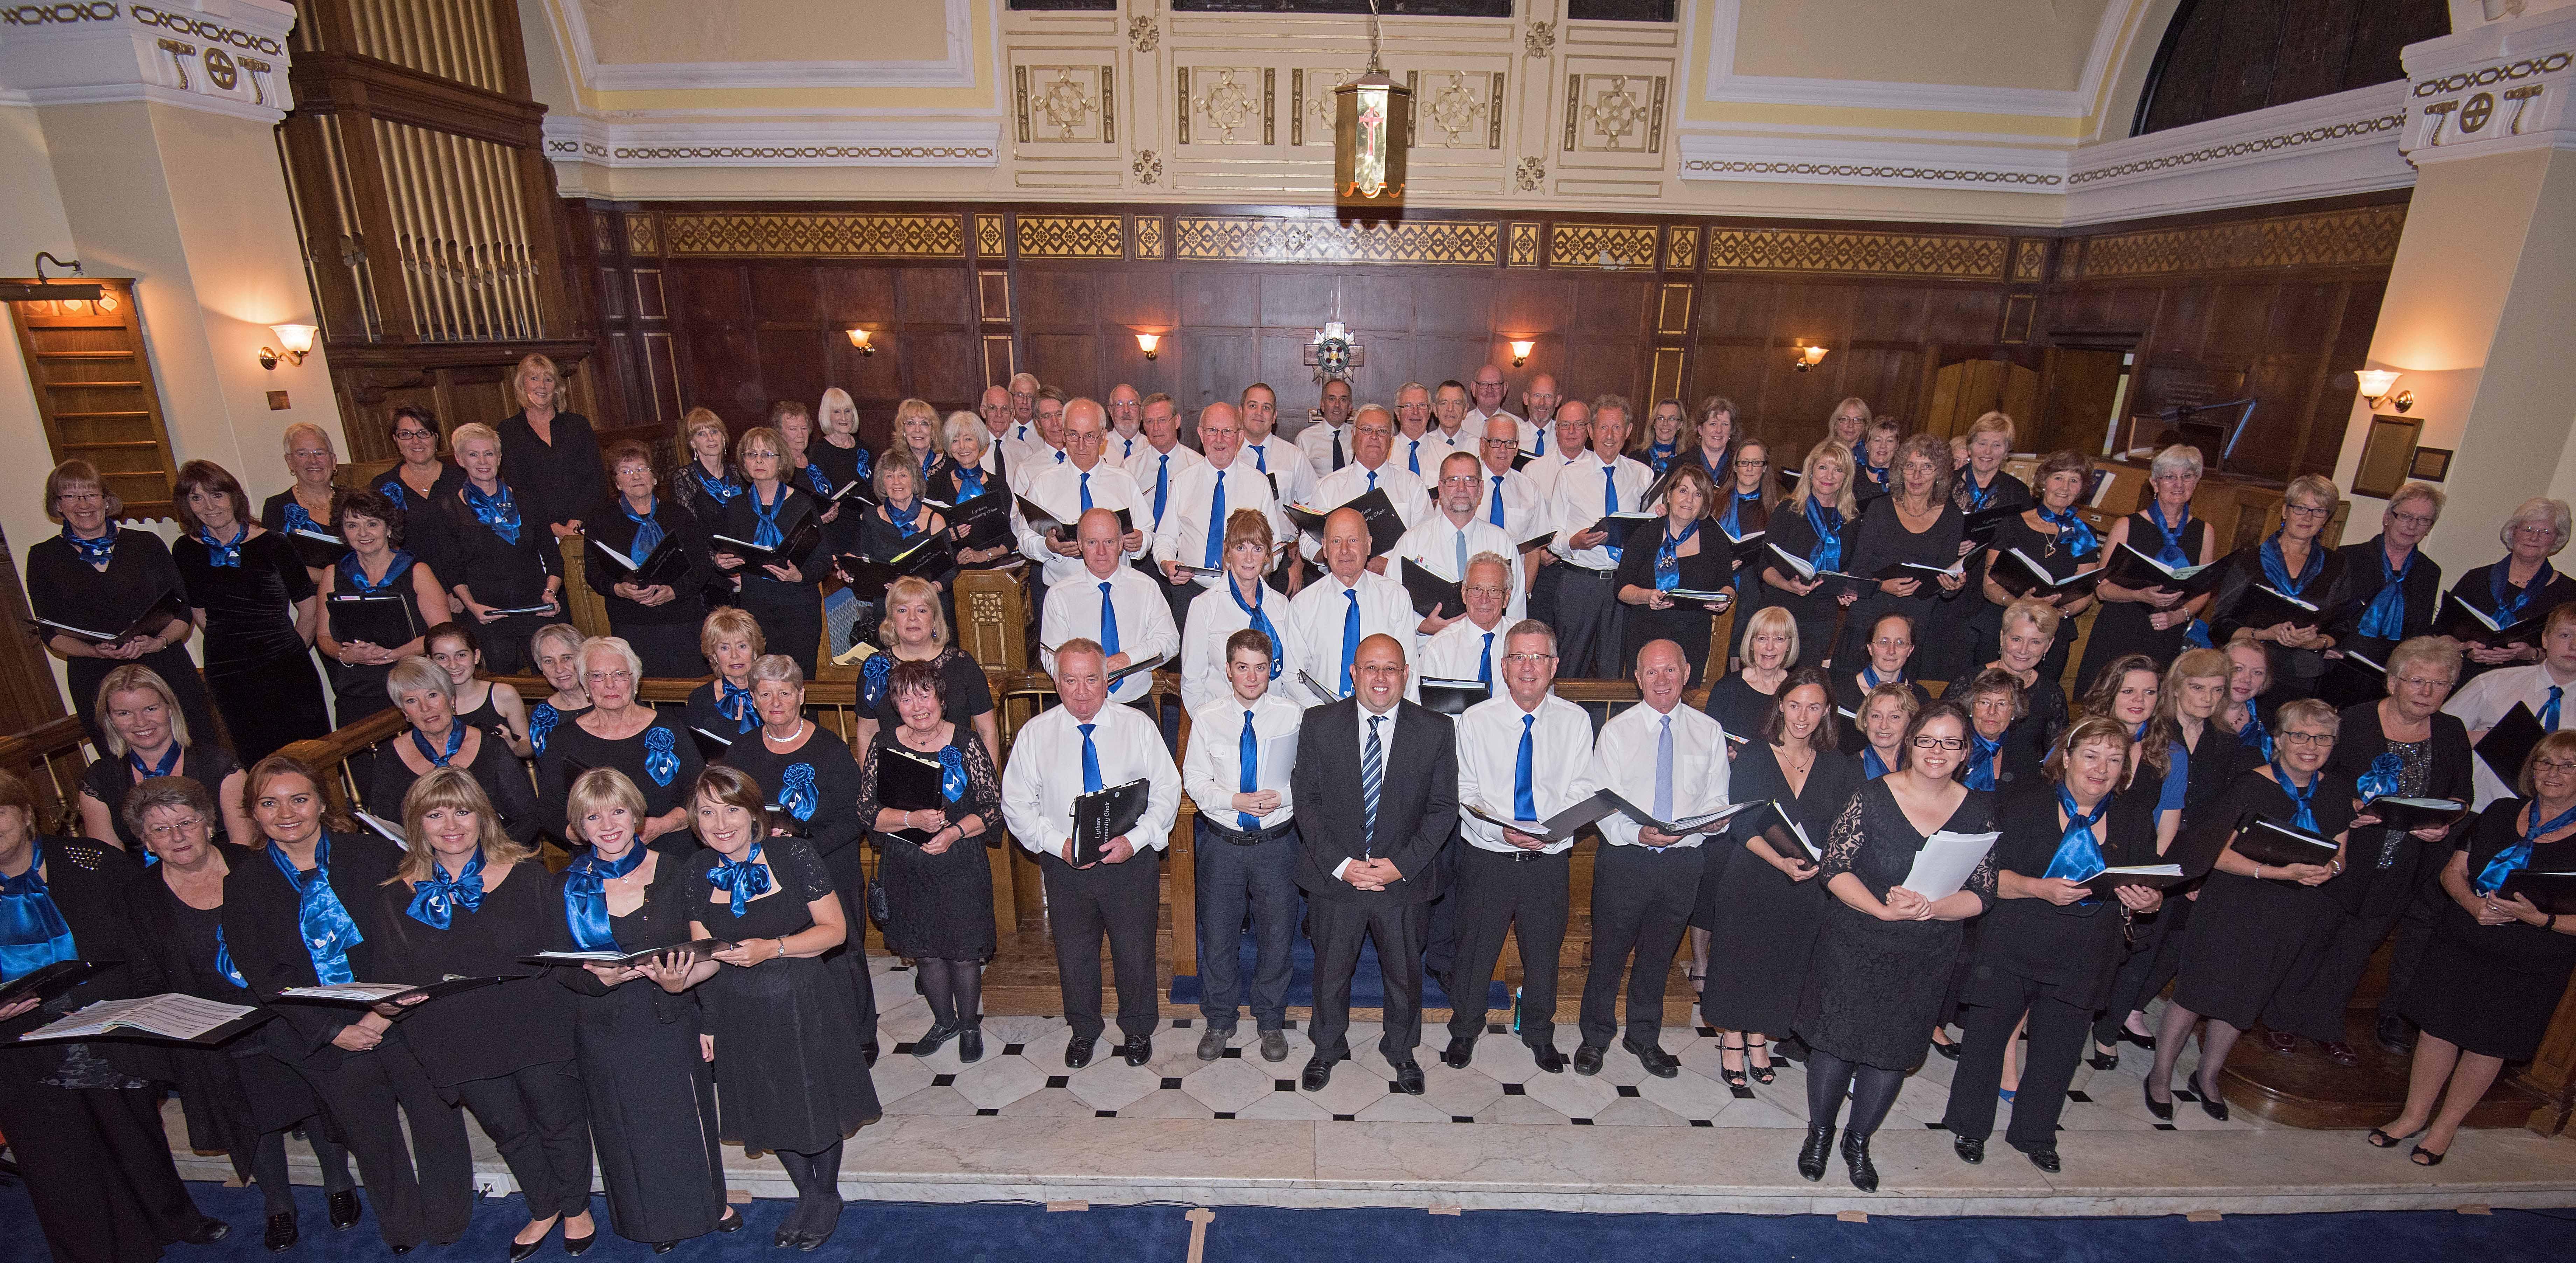 Lytham Community Choir Concert – Fairhaven United Reformed